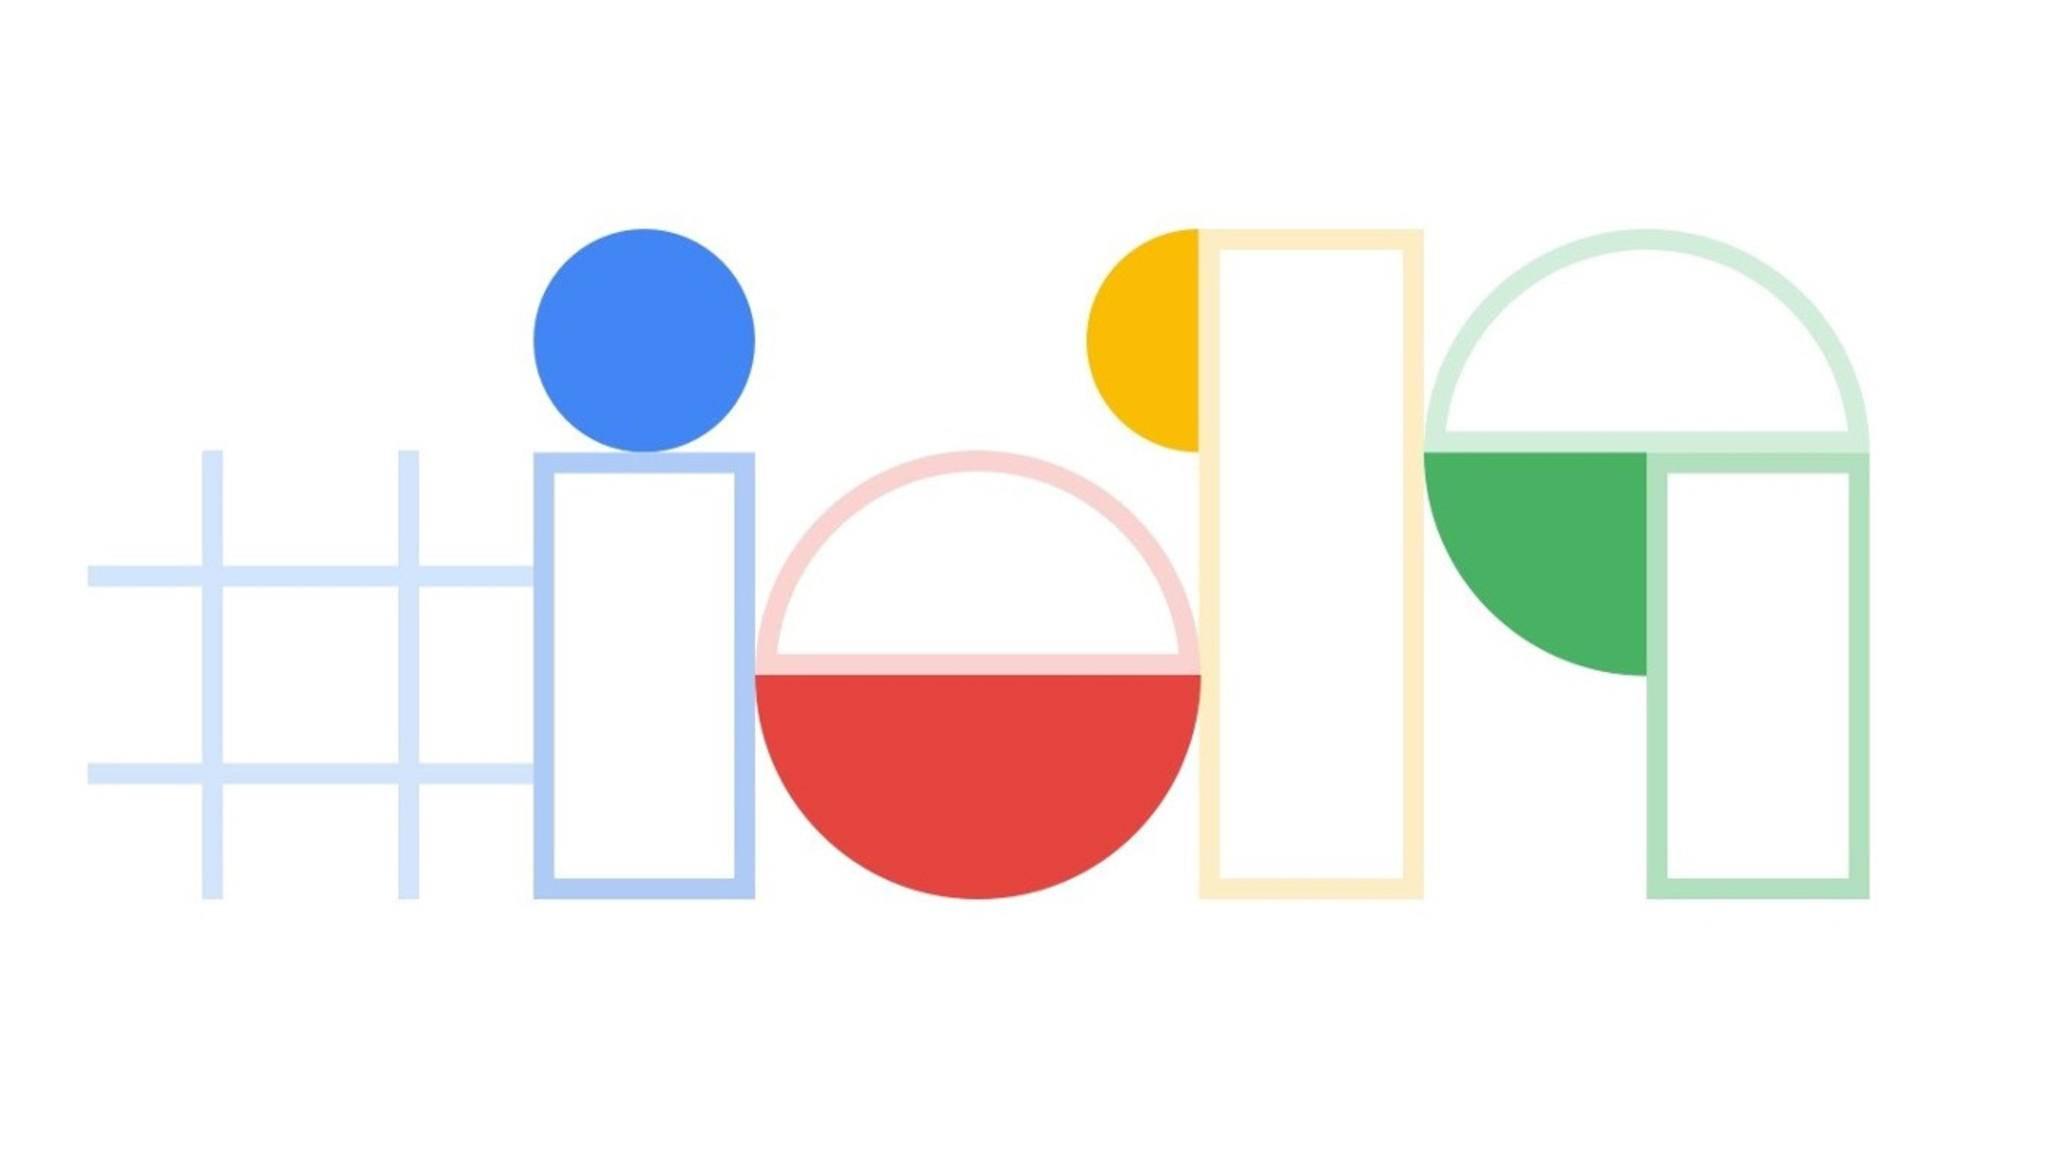 Die Google I/O 2019 startet am 7. Mai.